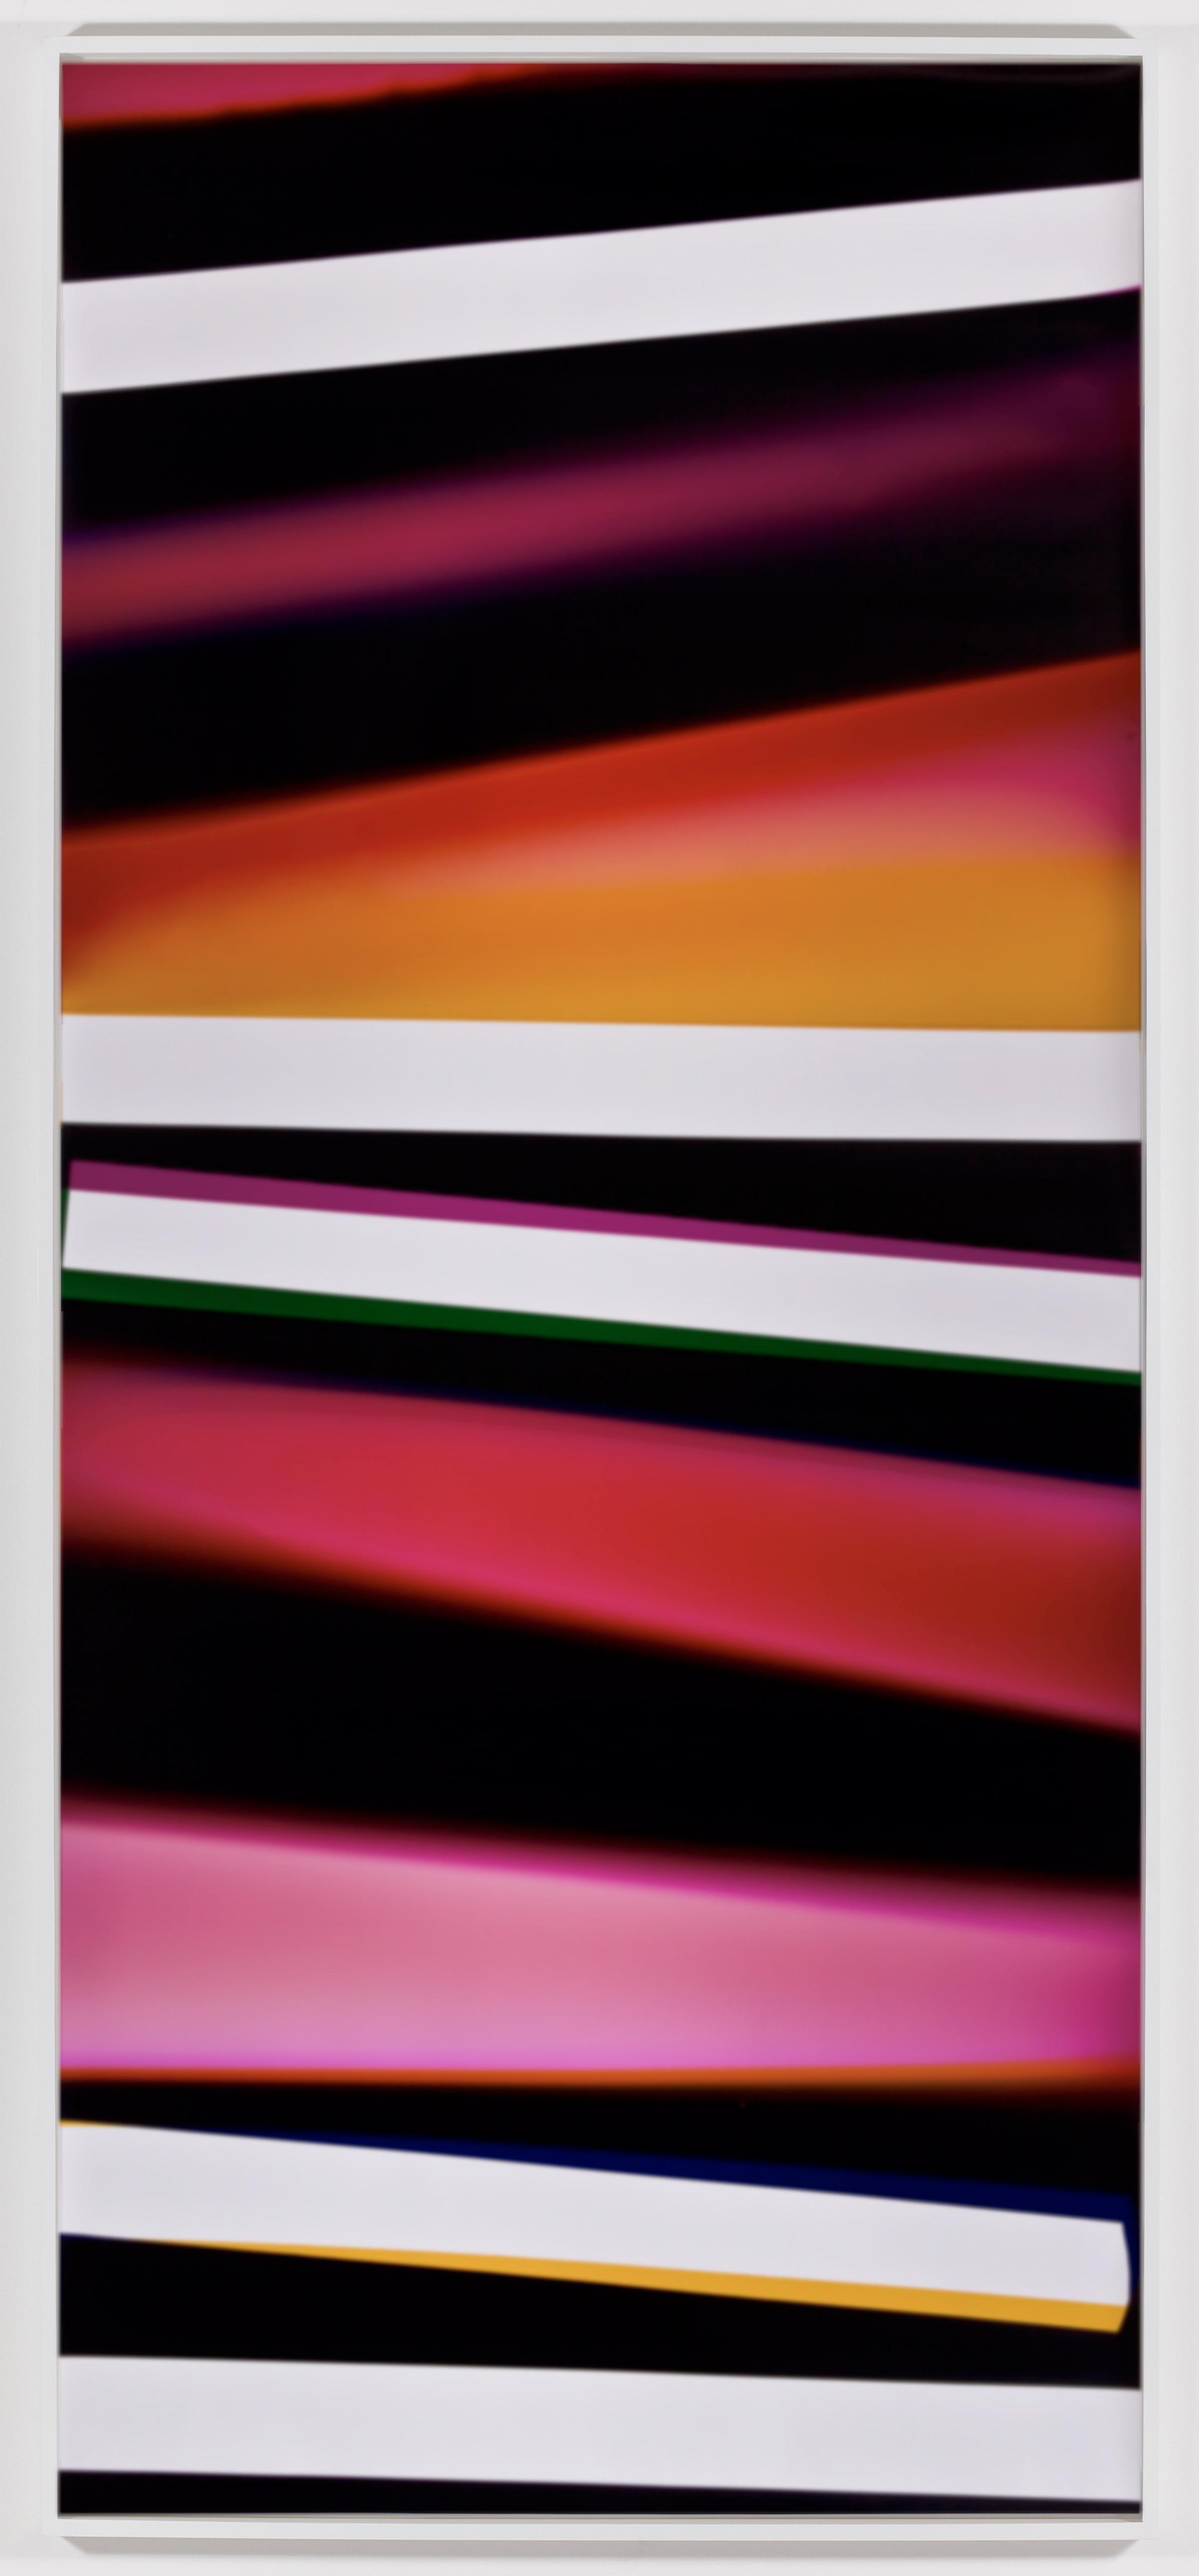 Black Curl (CMY/Five Magnet: Irvine, California, March 26,2010, Fujicolor Crystal Archive Super Type C, Em. No. 165-021, 07510)   2011  Color photographic paper  112 x 50 inches   Black Curls, 2010–2013    PROCESSCOLORFIELDS, 2011